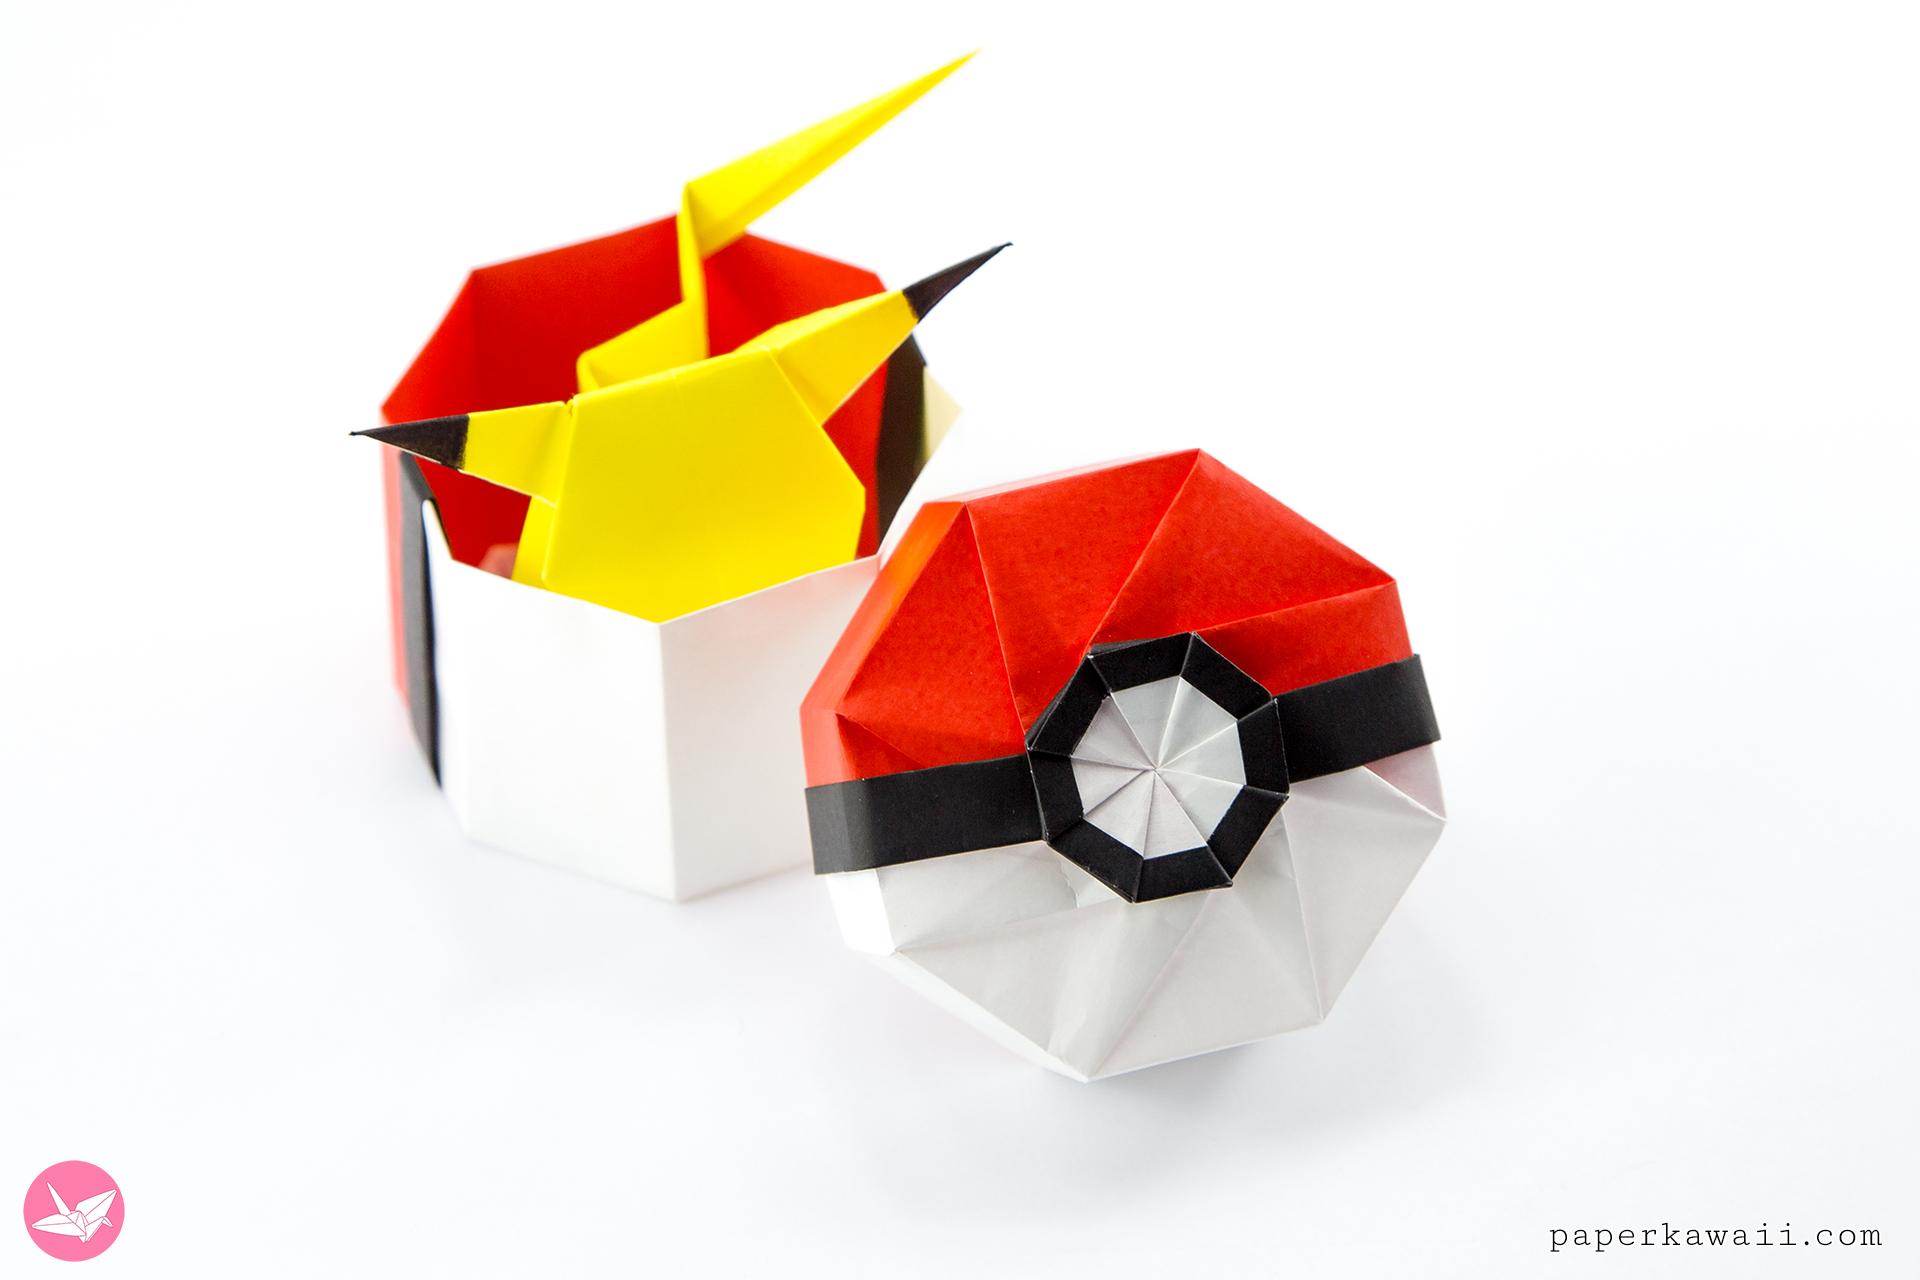 All Pokemon (Go) 3D Models for Free   All3DP   1280x1920